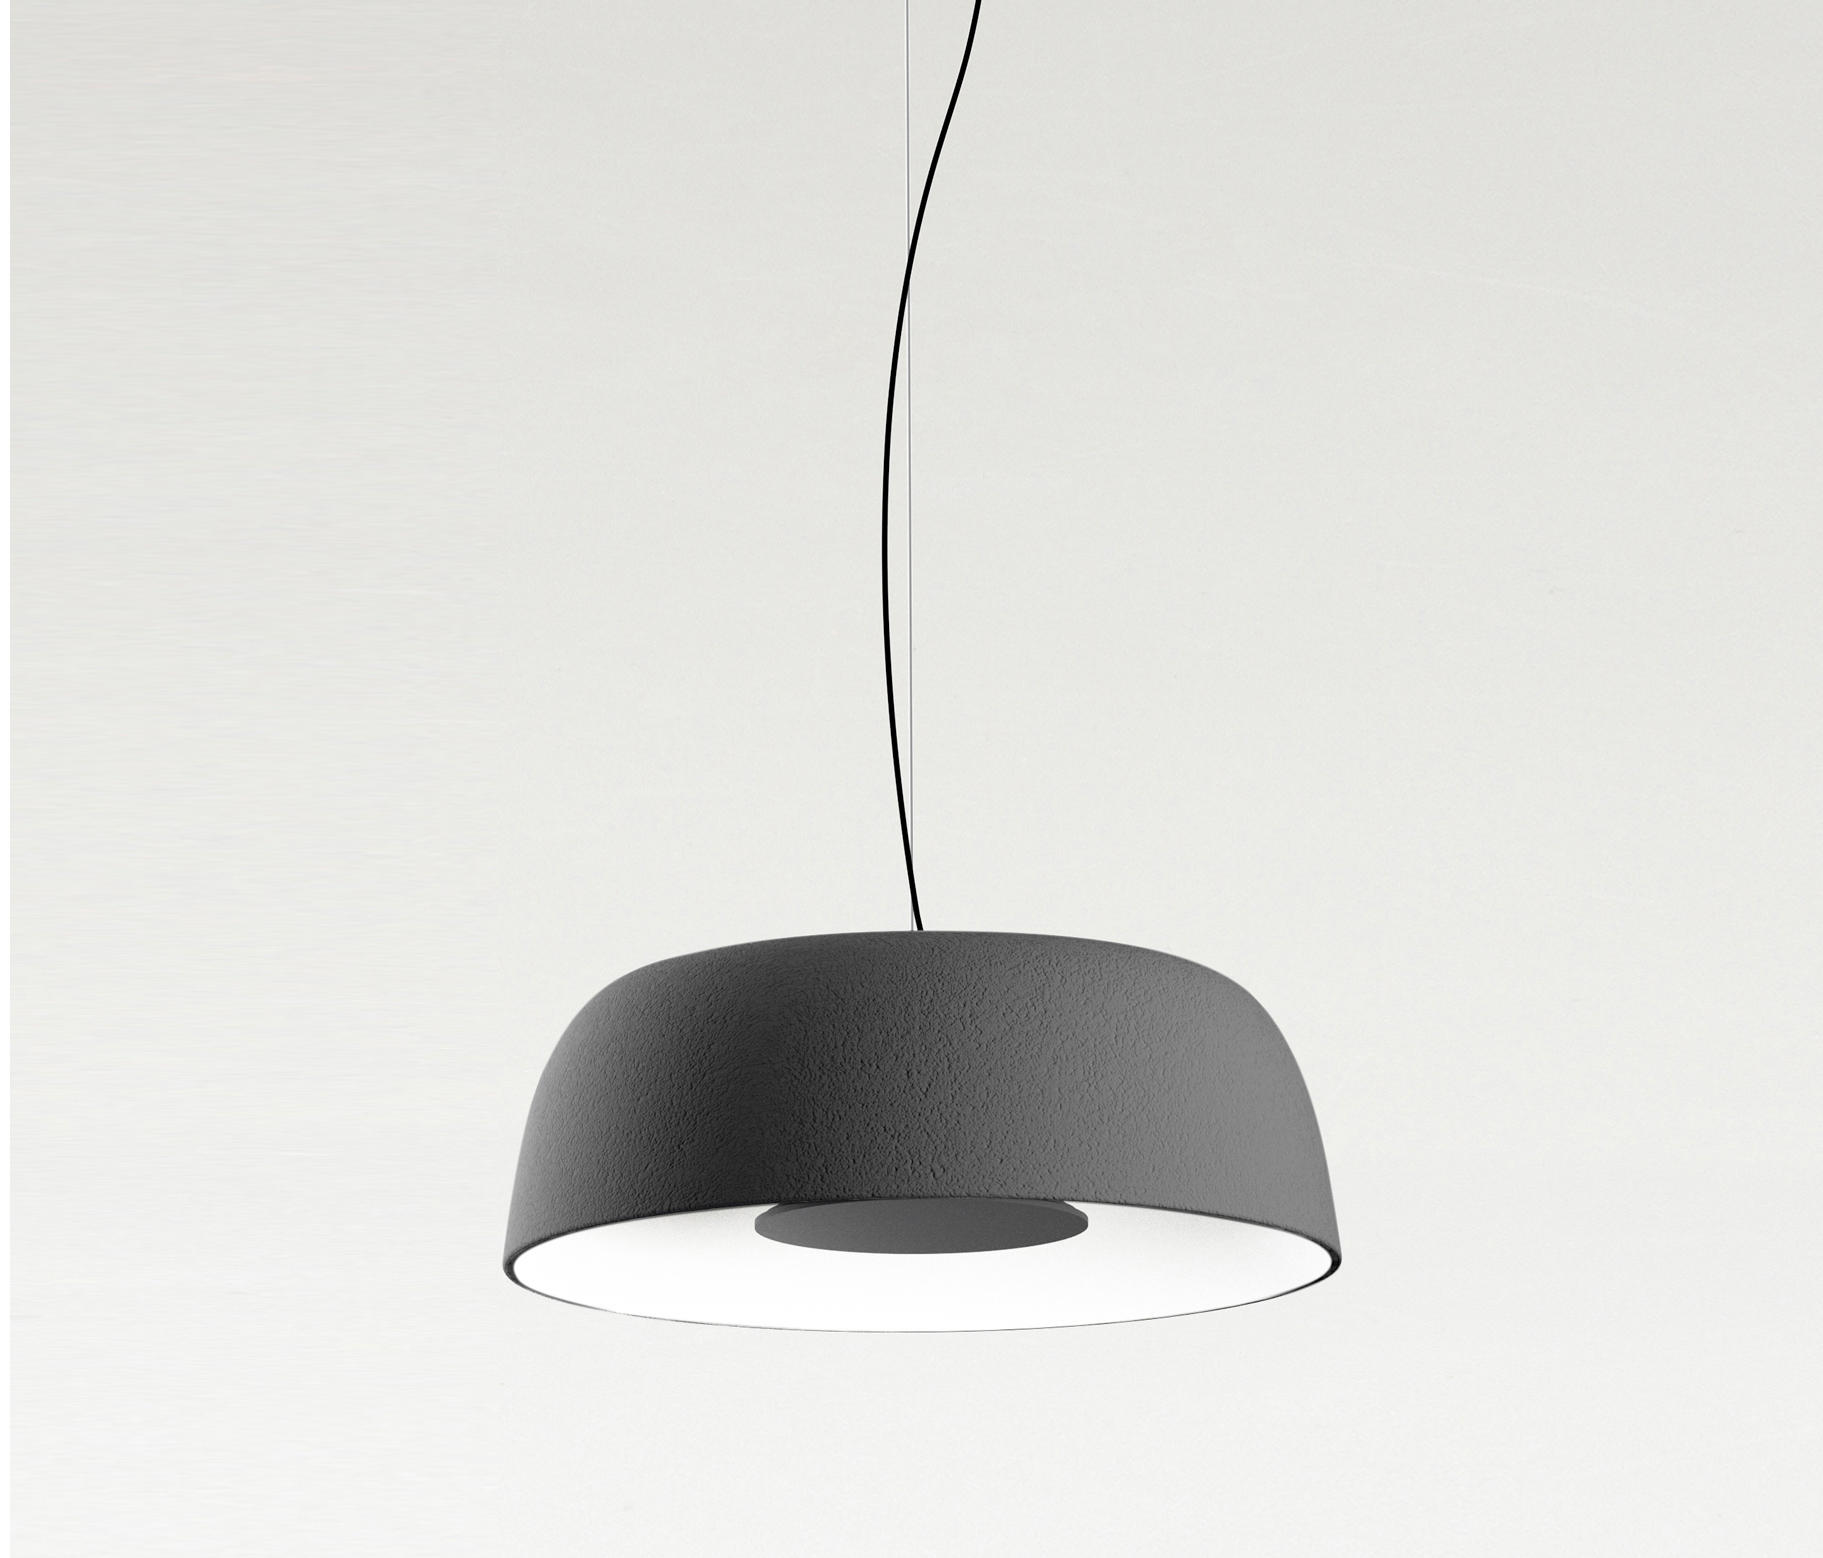 Djembé Lamp by Joan Gaspar for Marset